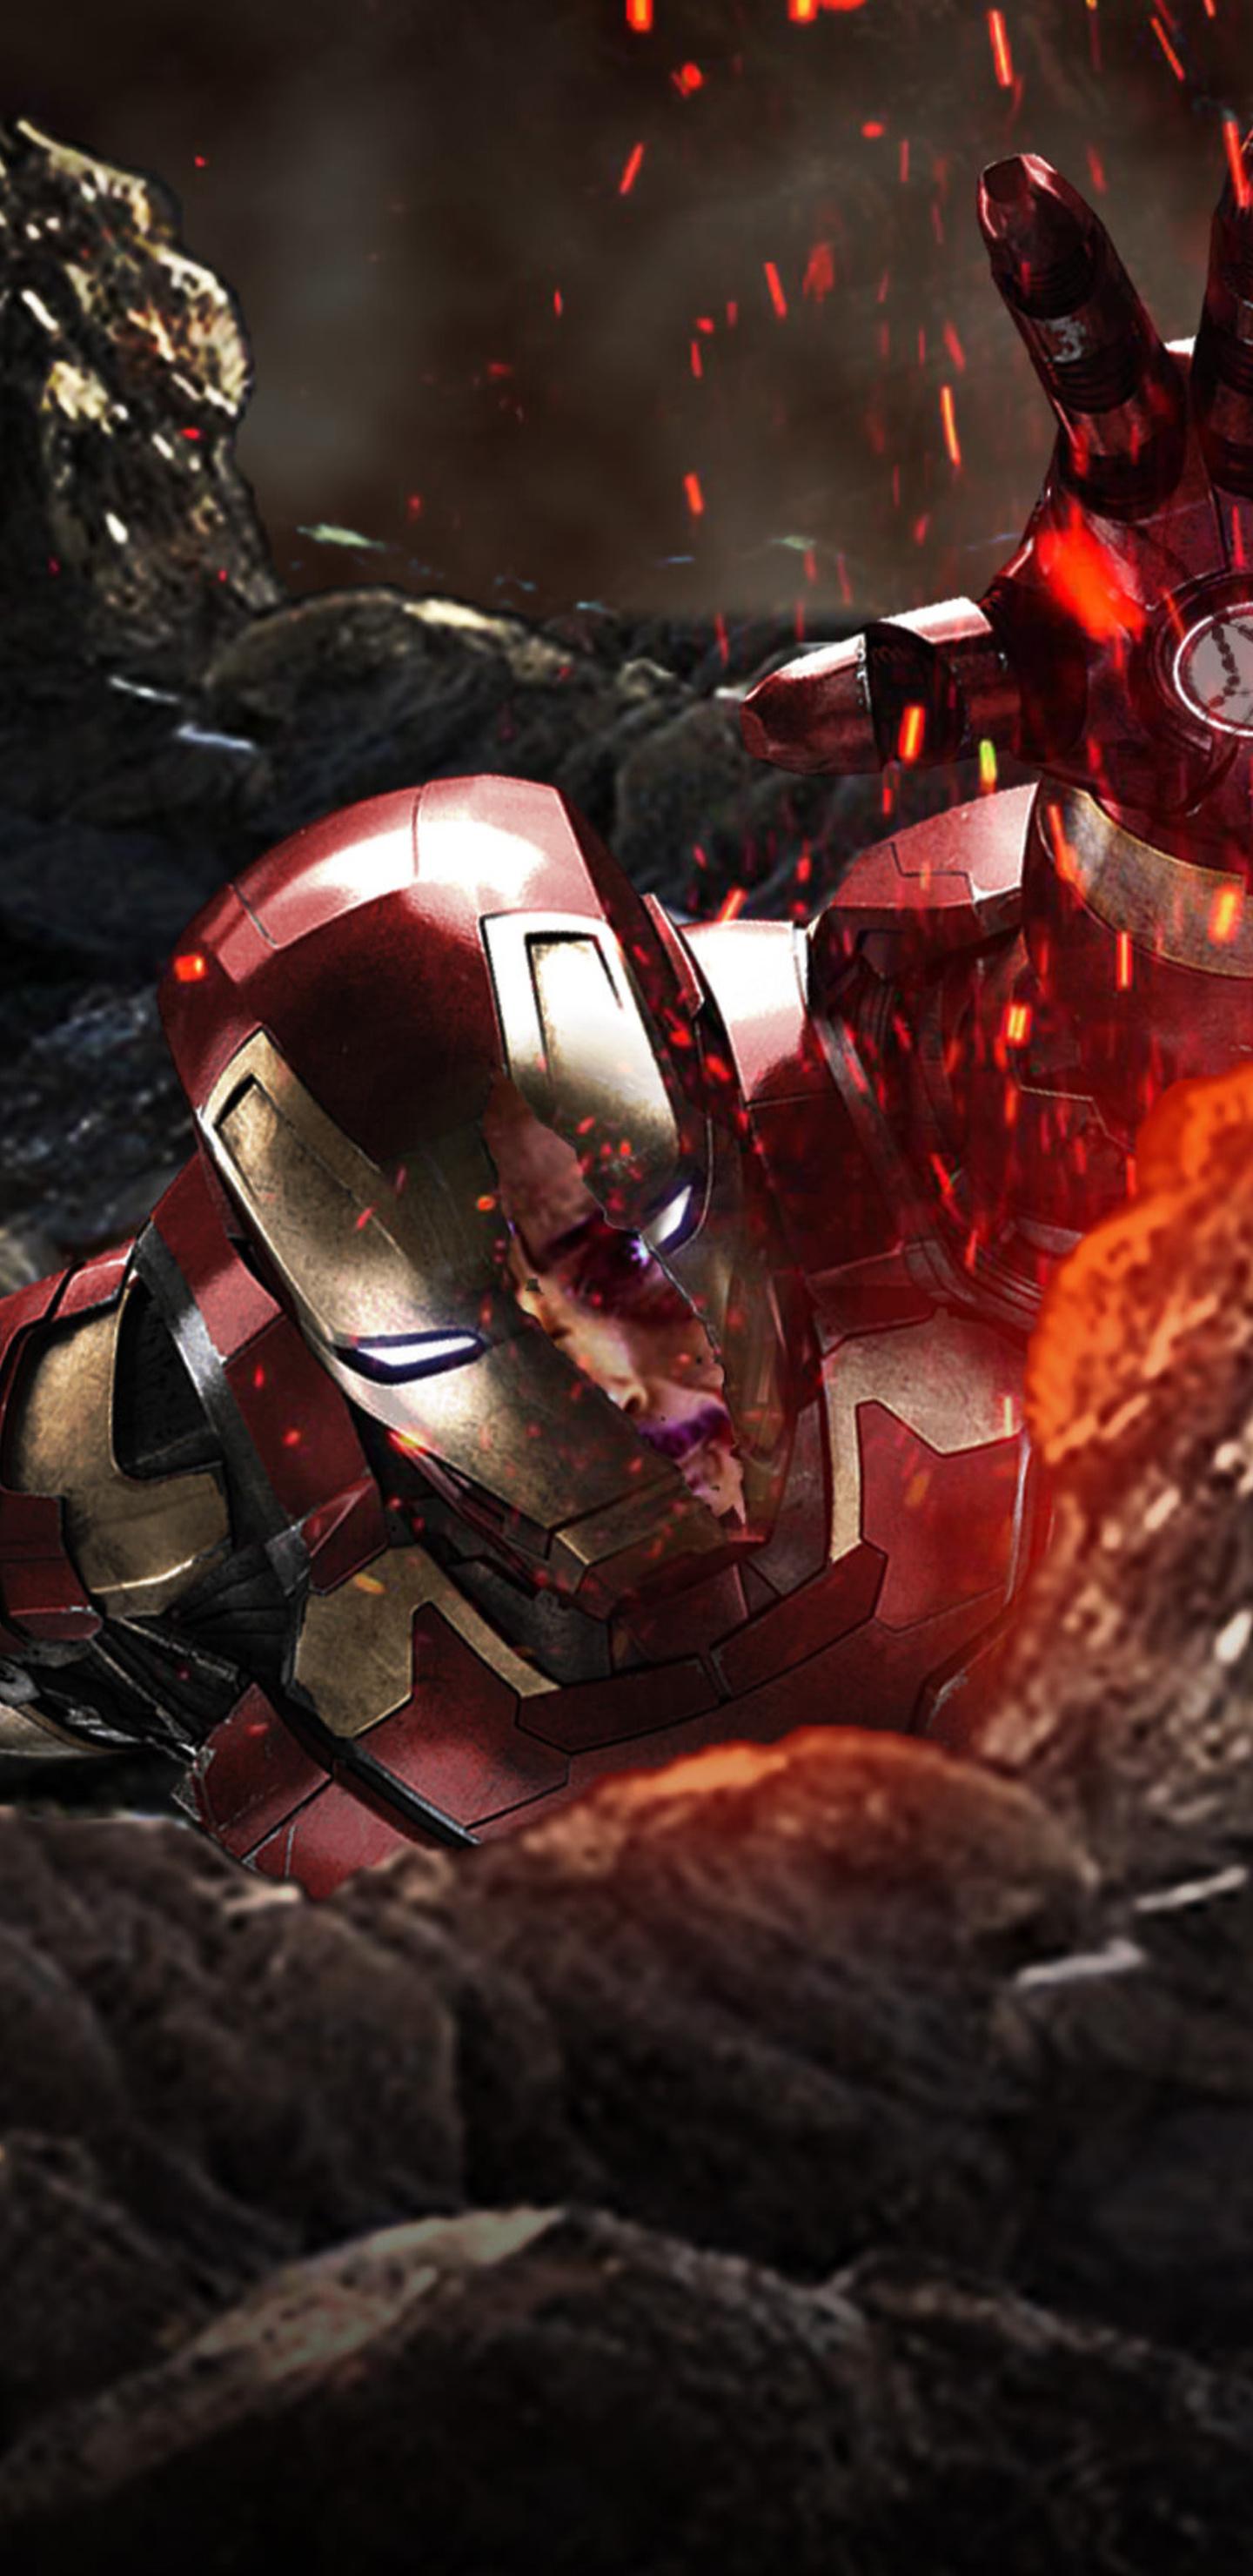 1440x2960 Iron Man In Avengers Infinity War Samsung Galaxy Note 9 8